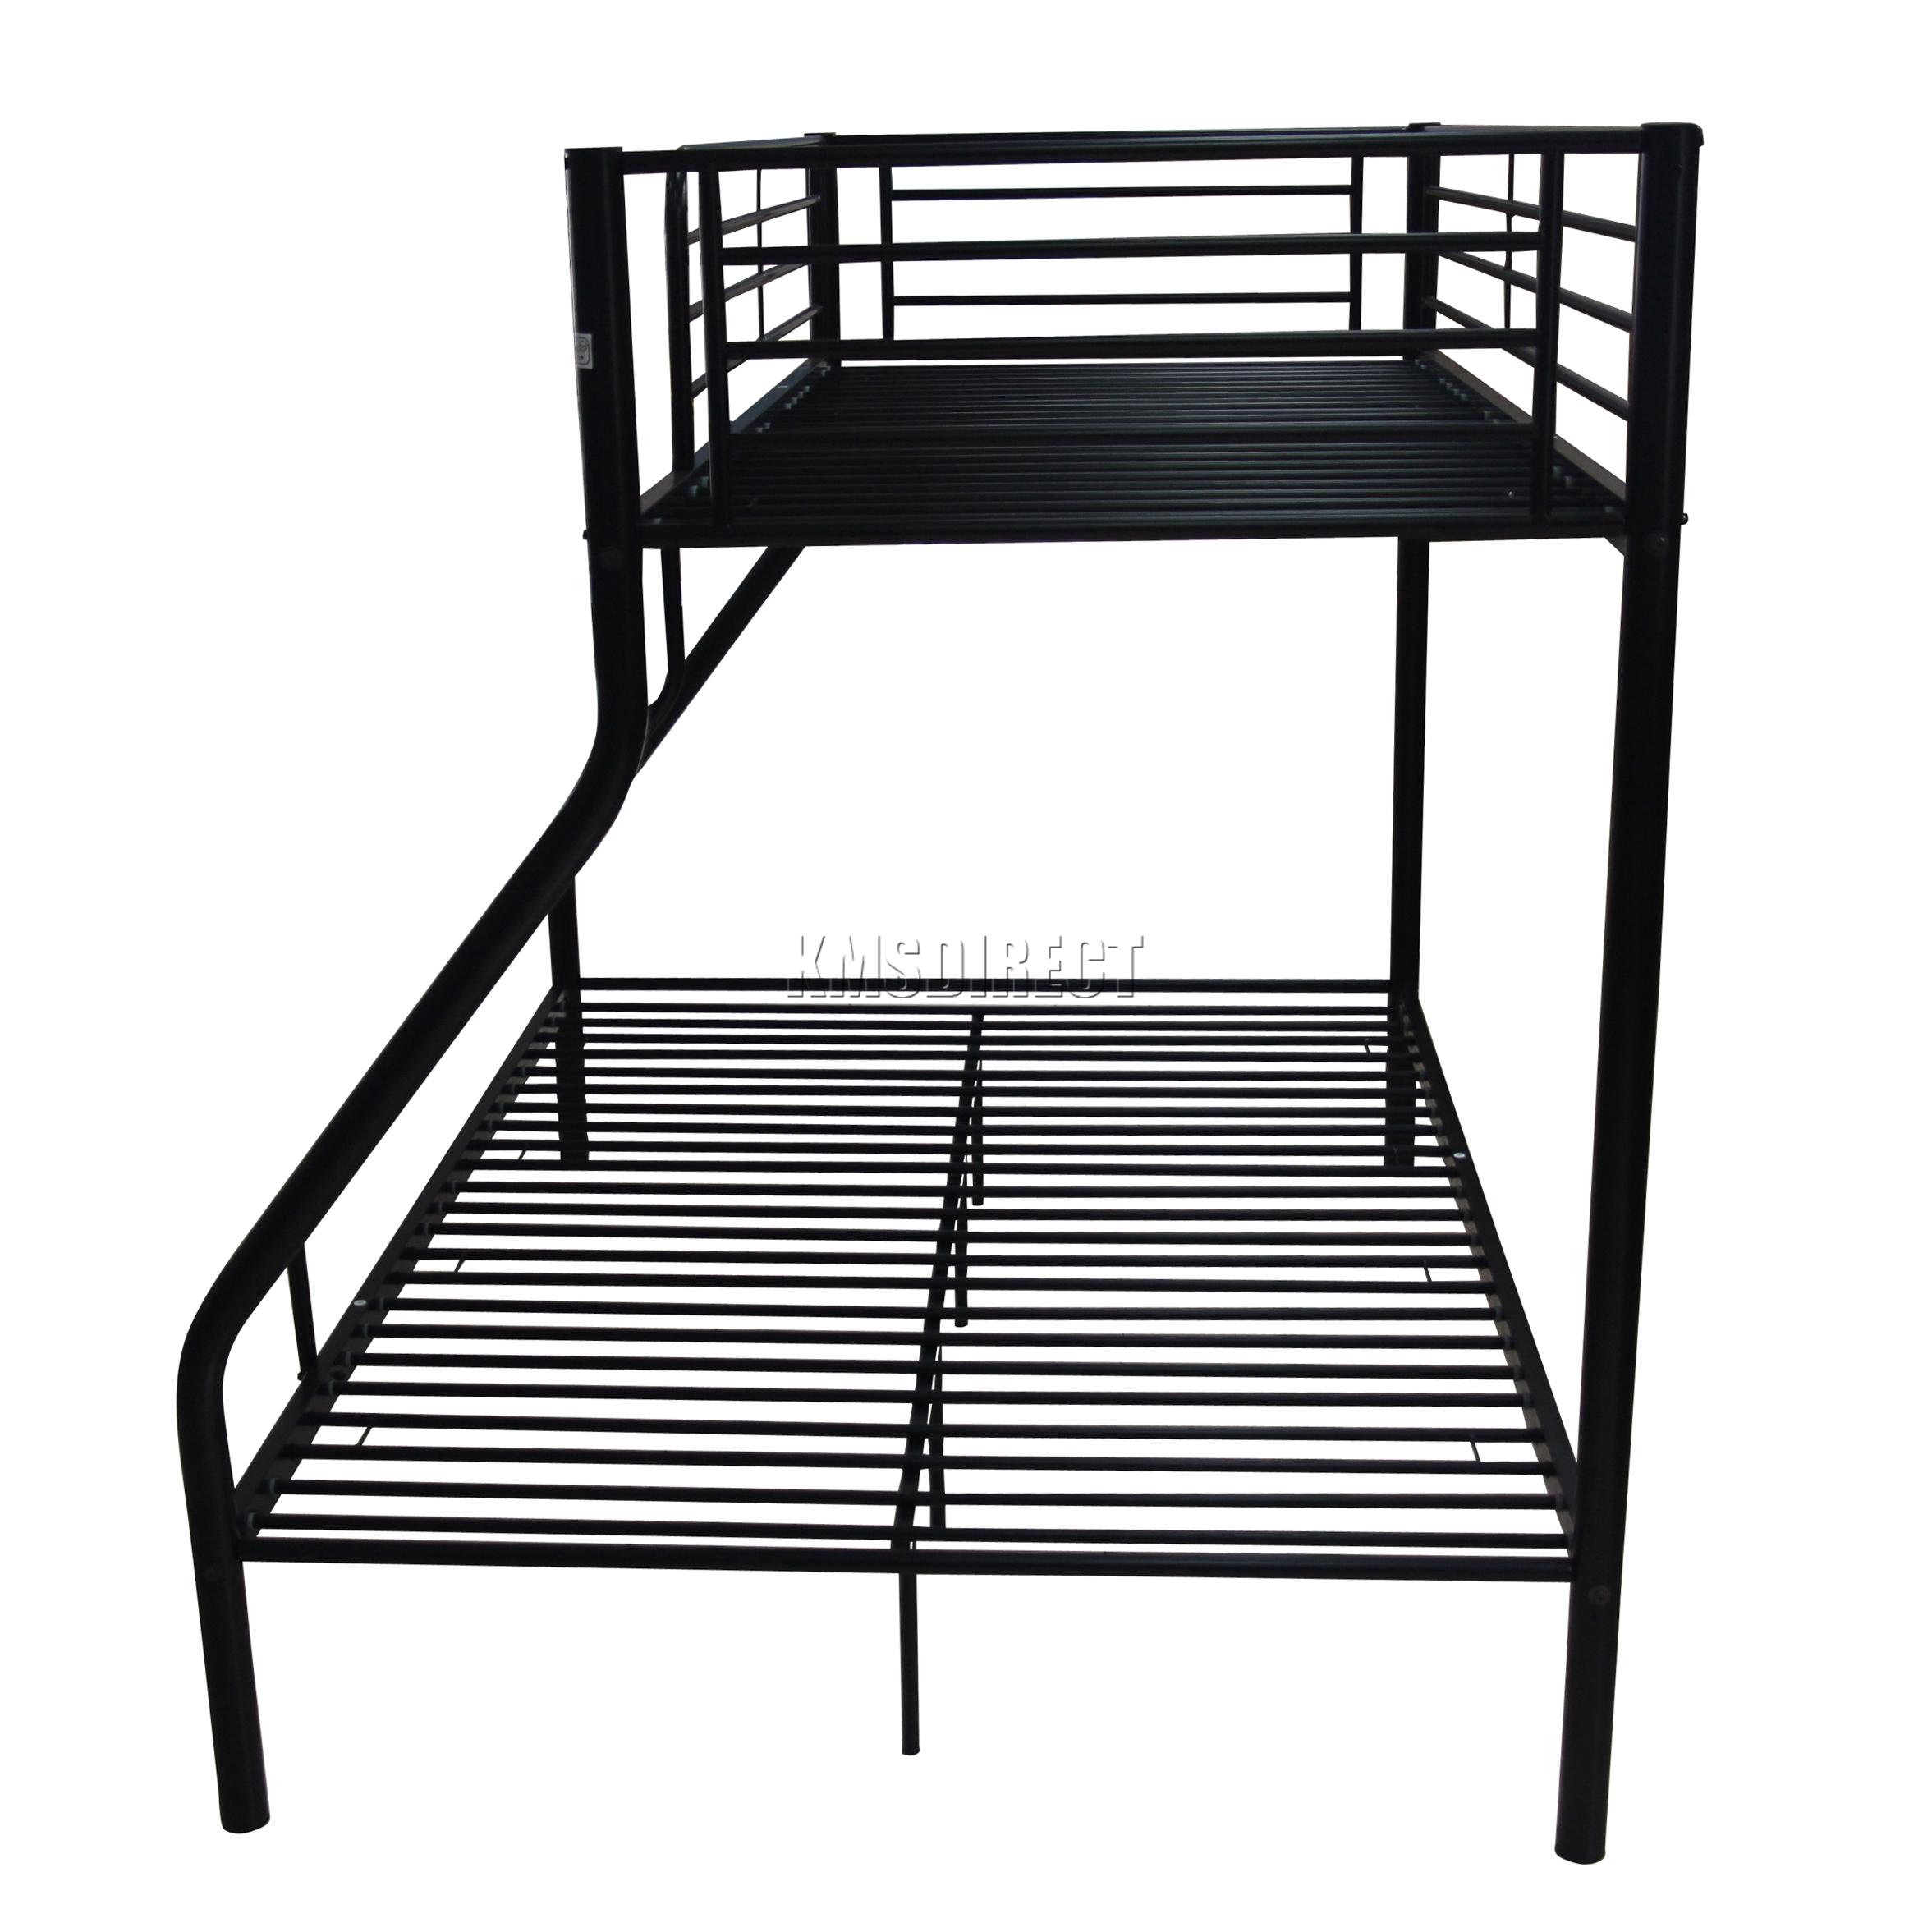 Foxhunter bunk bed single double triple children metal